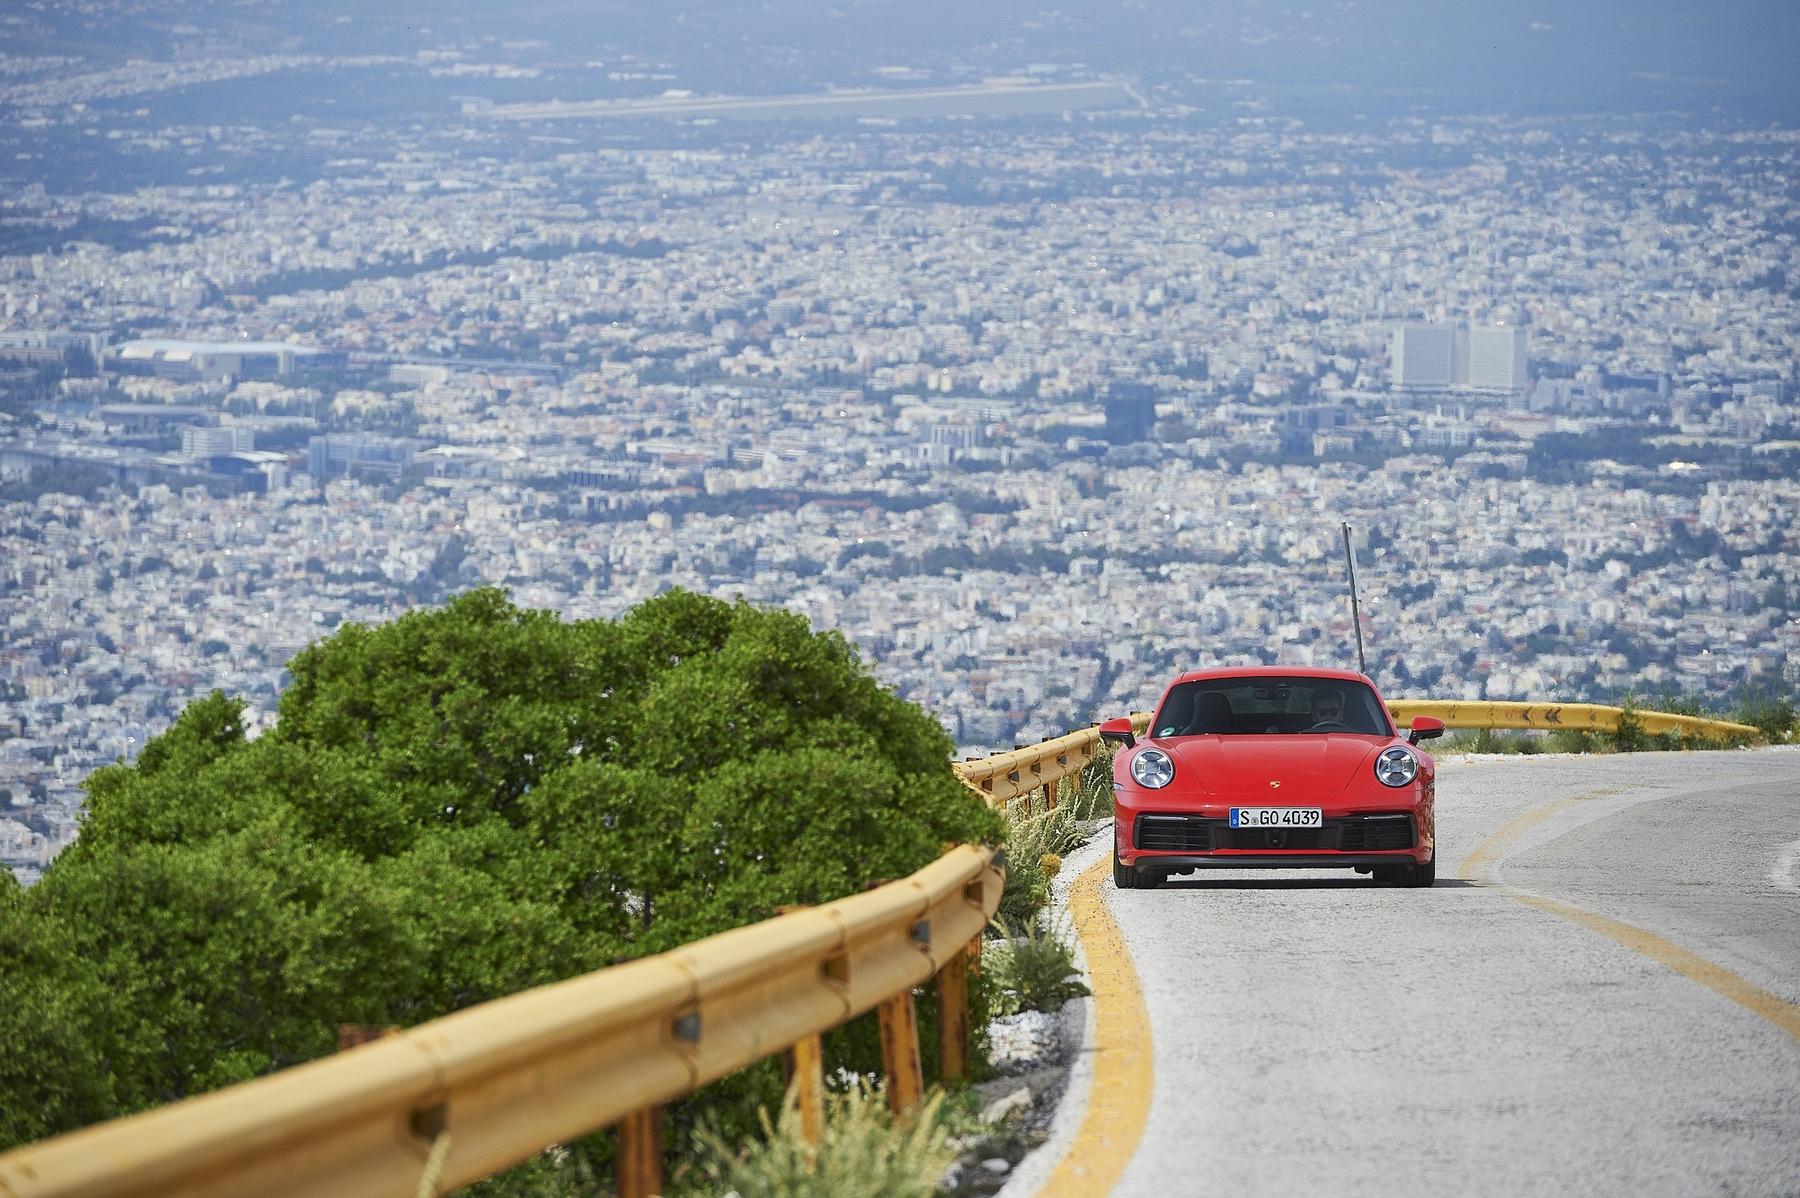 Test_Drive_Porsche_911_Athens_0081